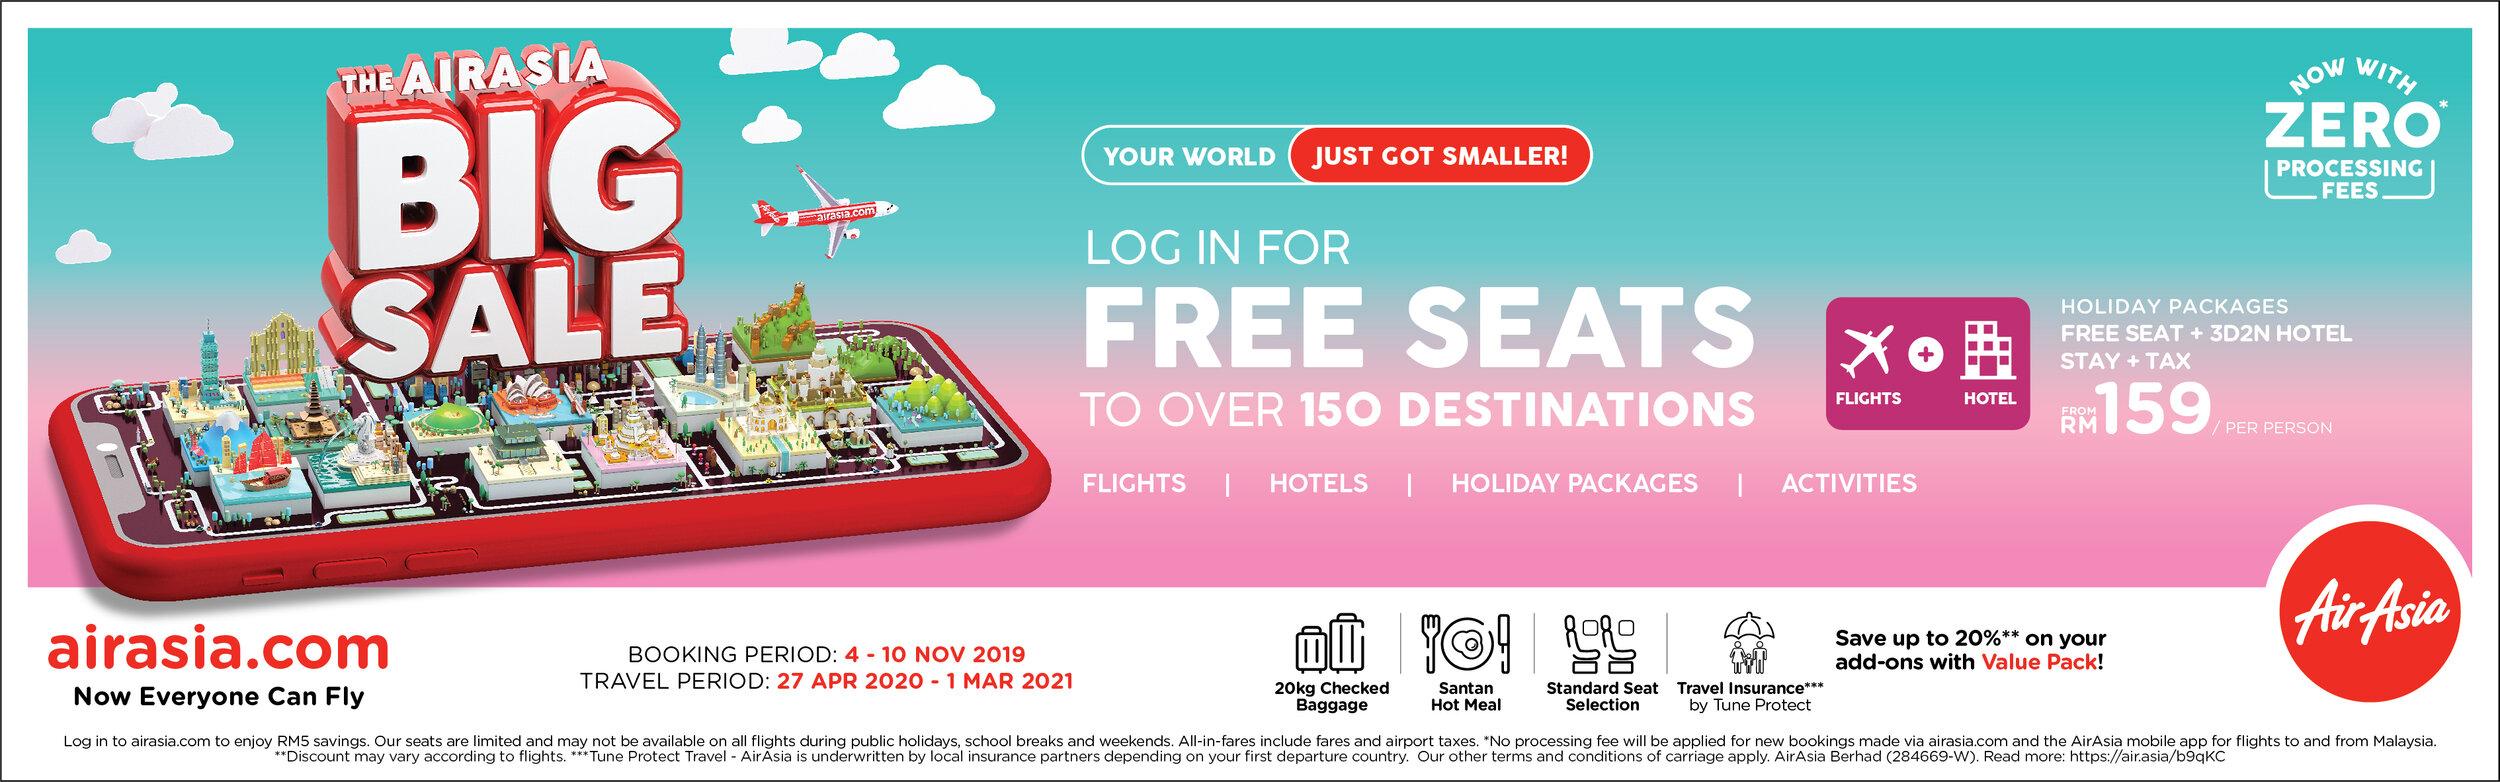 Airasia promotion 2020 malaysia